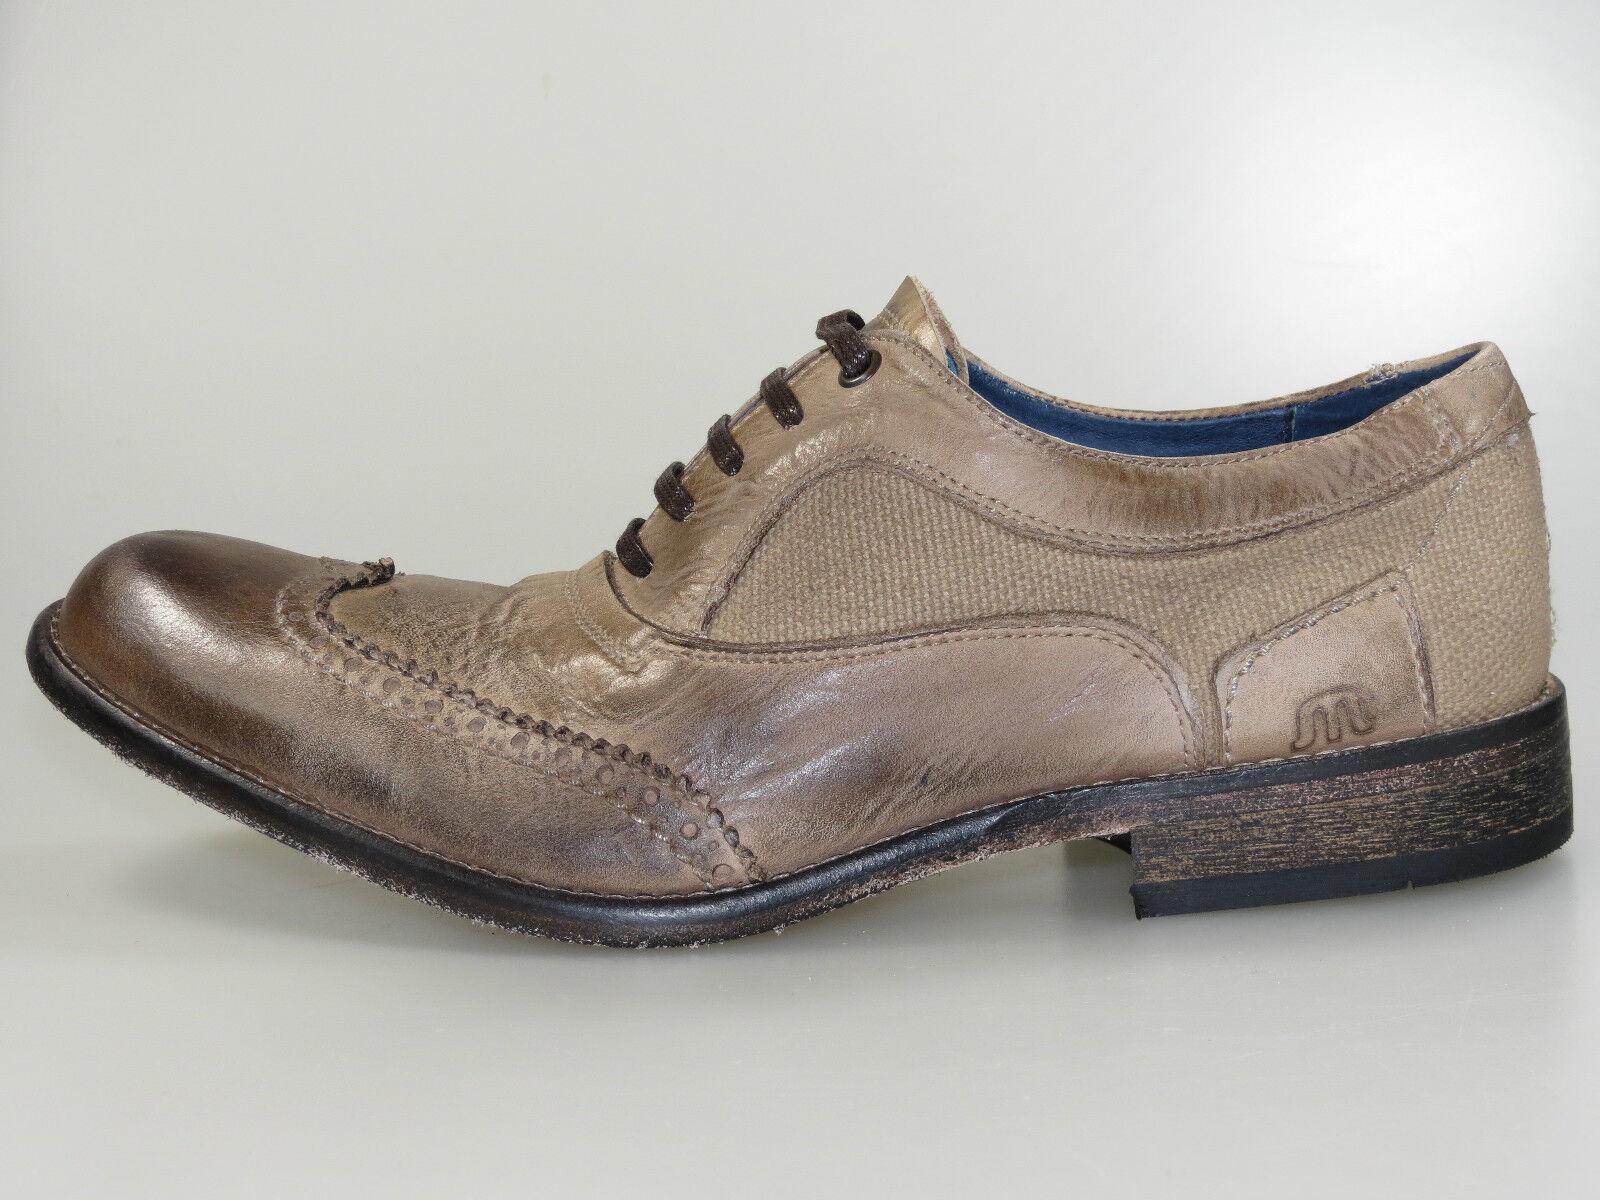 Maruti Schuhe Siena Men 66.20147.2057 Braun canvas Leder braun +NEU+